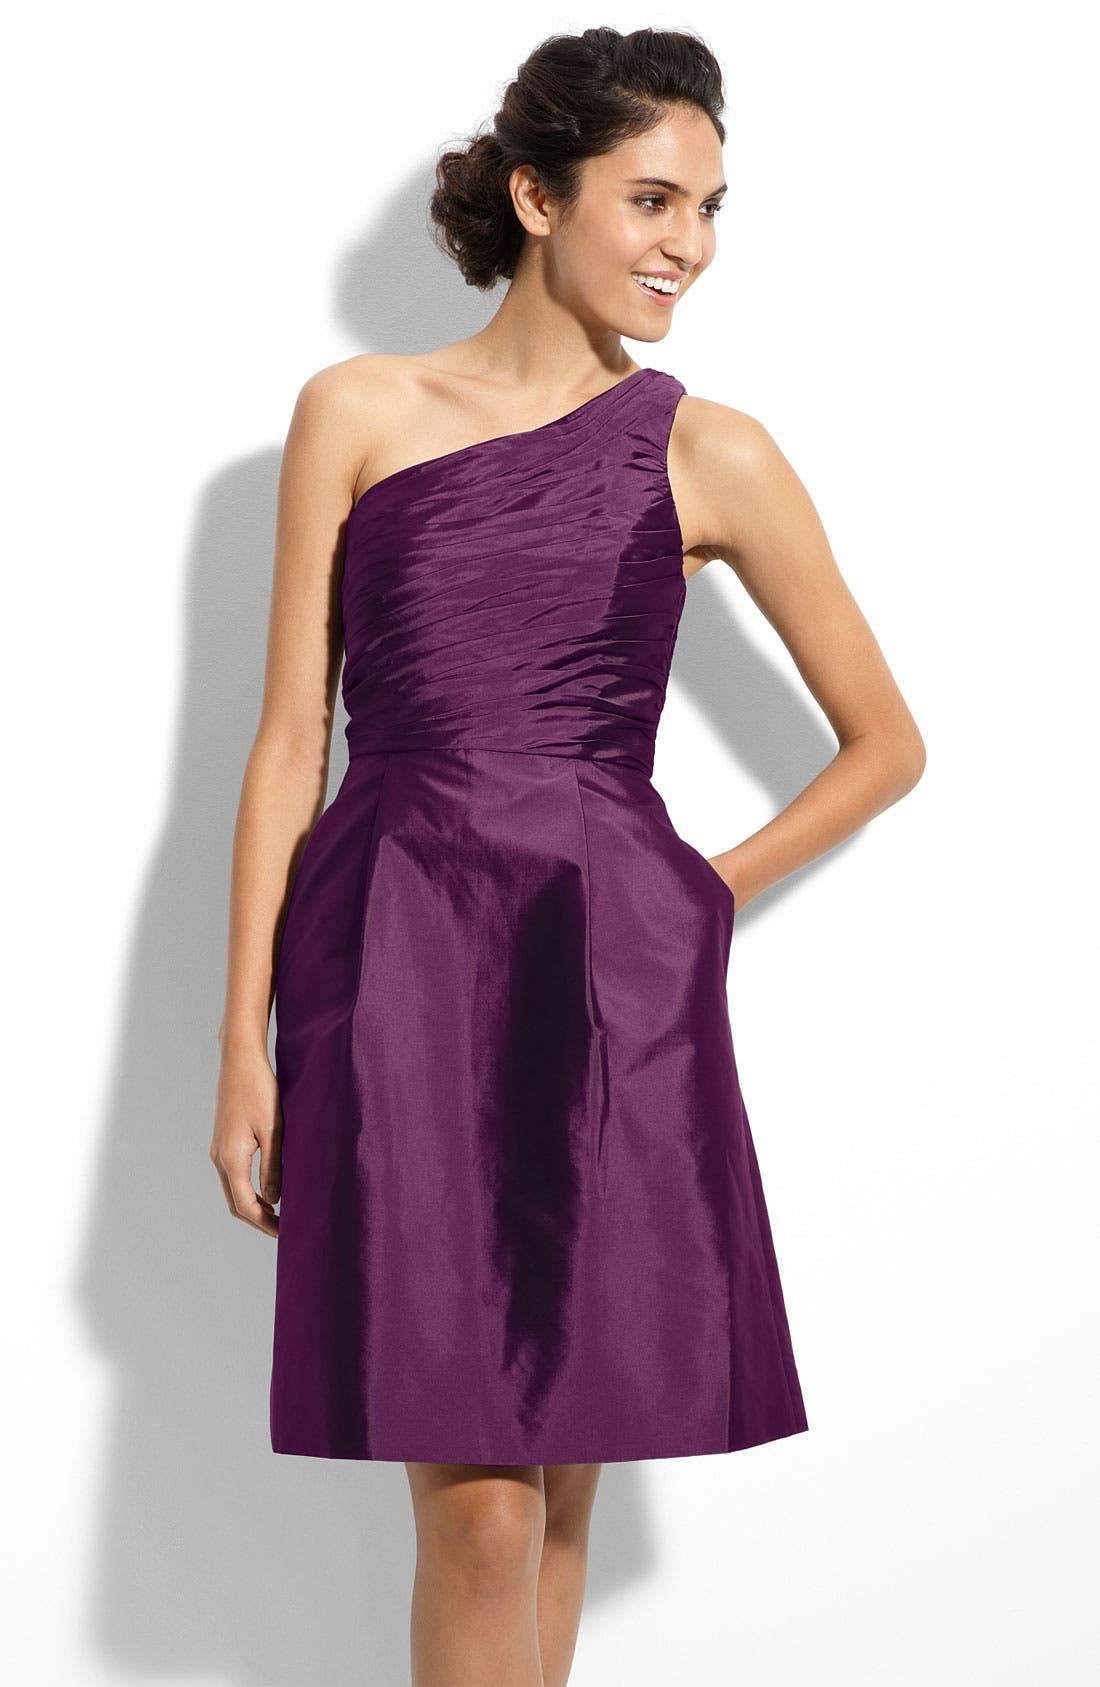 Alternate Image 1 Selected - ML Monique Lhuillier Bridesmaids One Shoulder Taffeta Dress